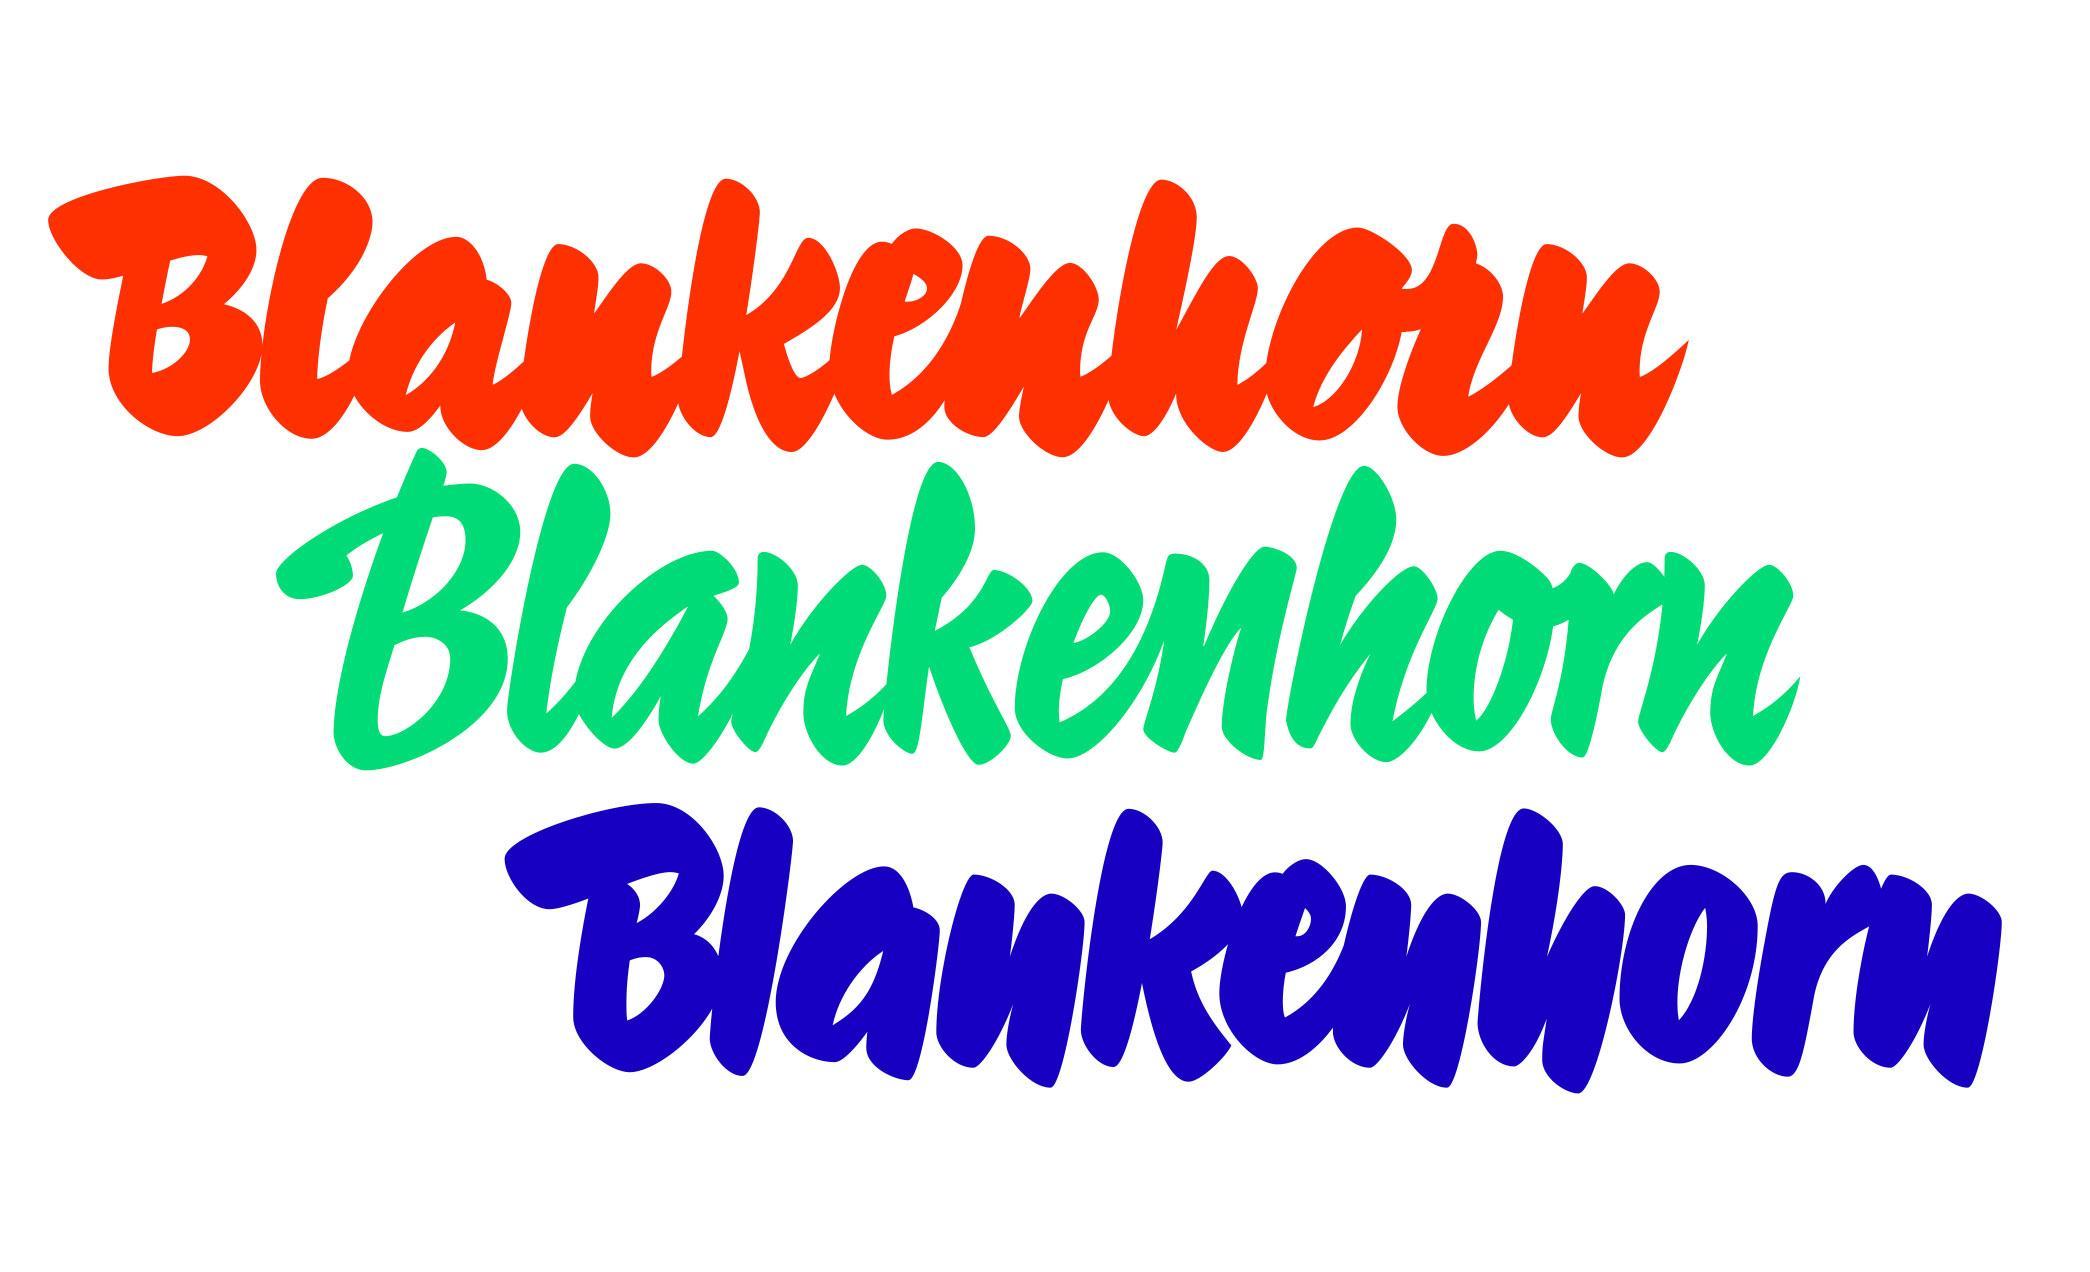 Blankenhorn by Lineto